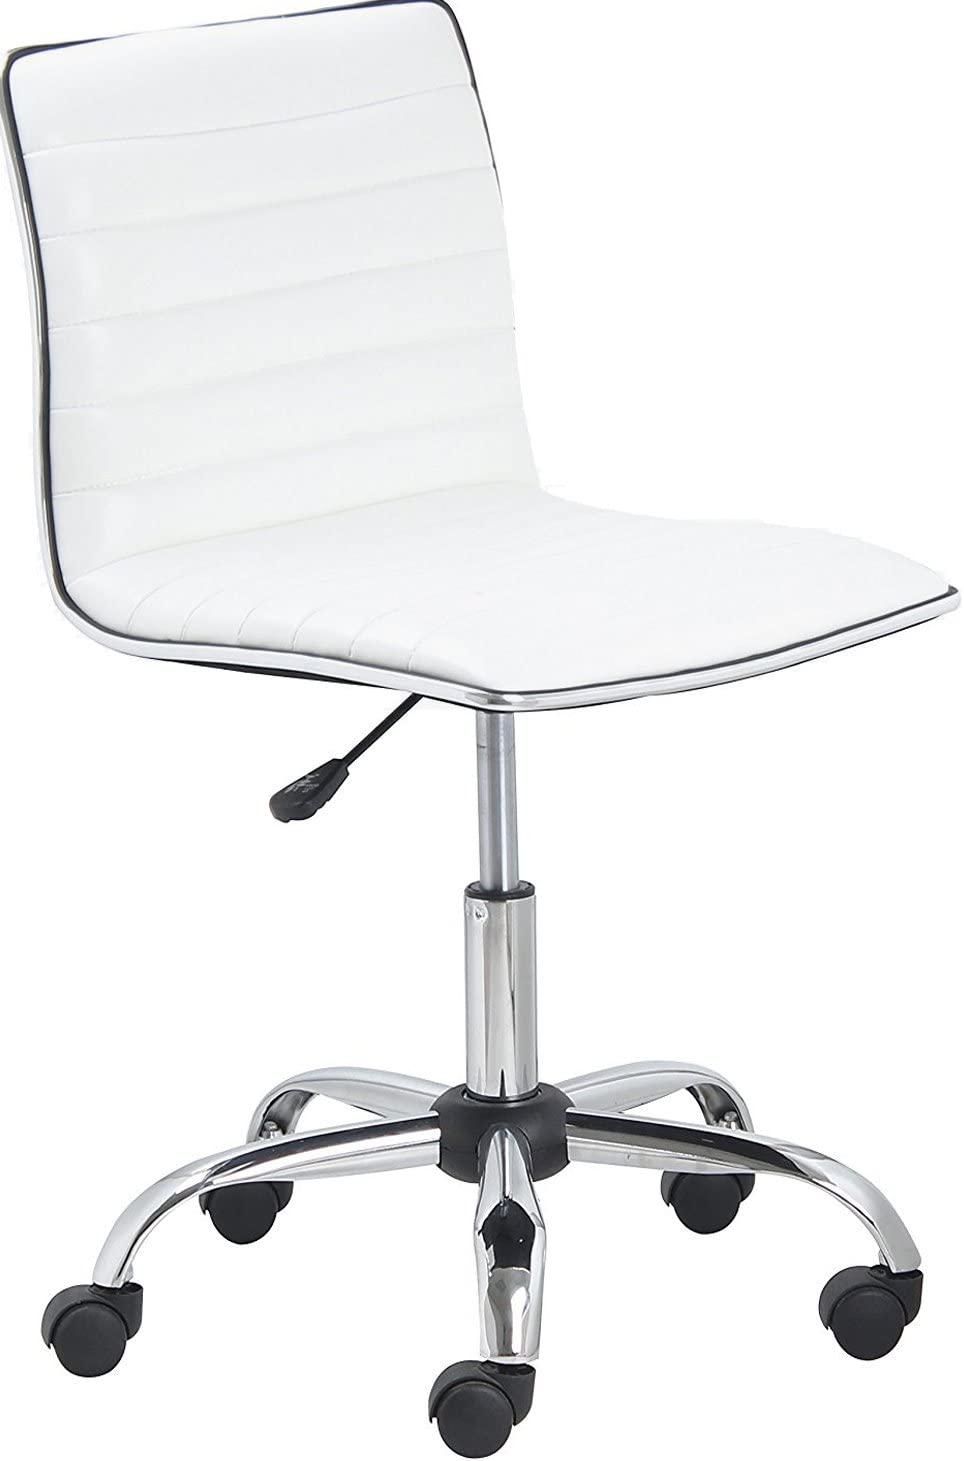 BTEXPERT BTExpert Swivel Mid Back Armless Ribbed Designer Task Chair Leather Soft Upholstery Office Chair - White